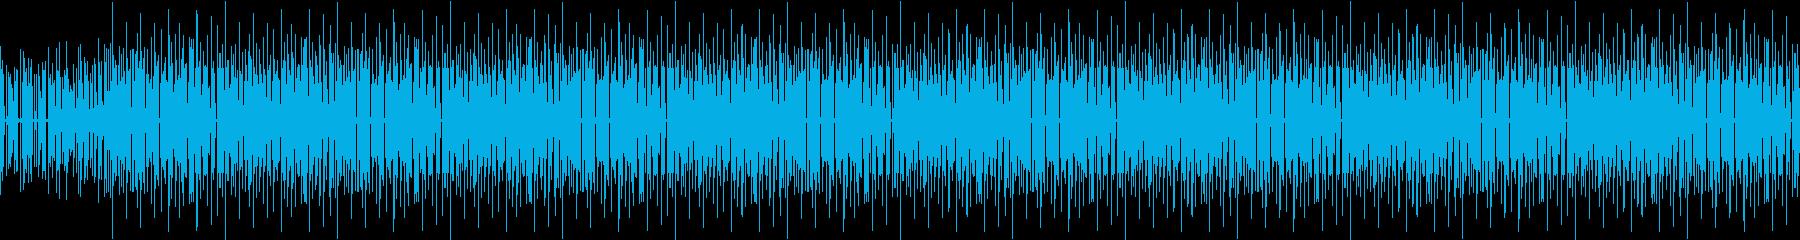 【BGM】ジャズ・カフェ・お洒落・レトロの再生済みの波形